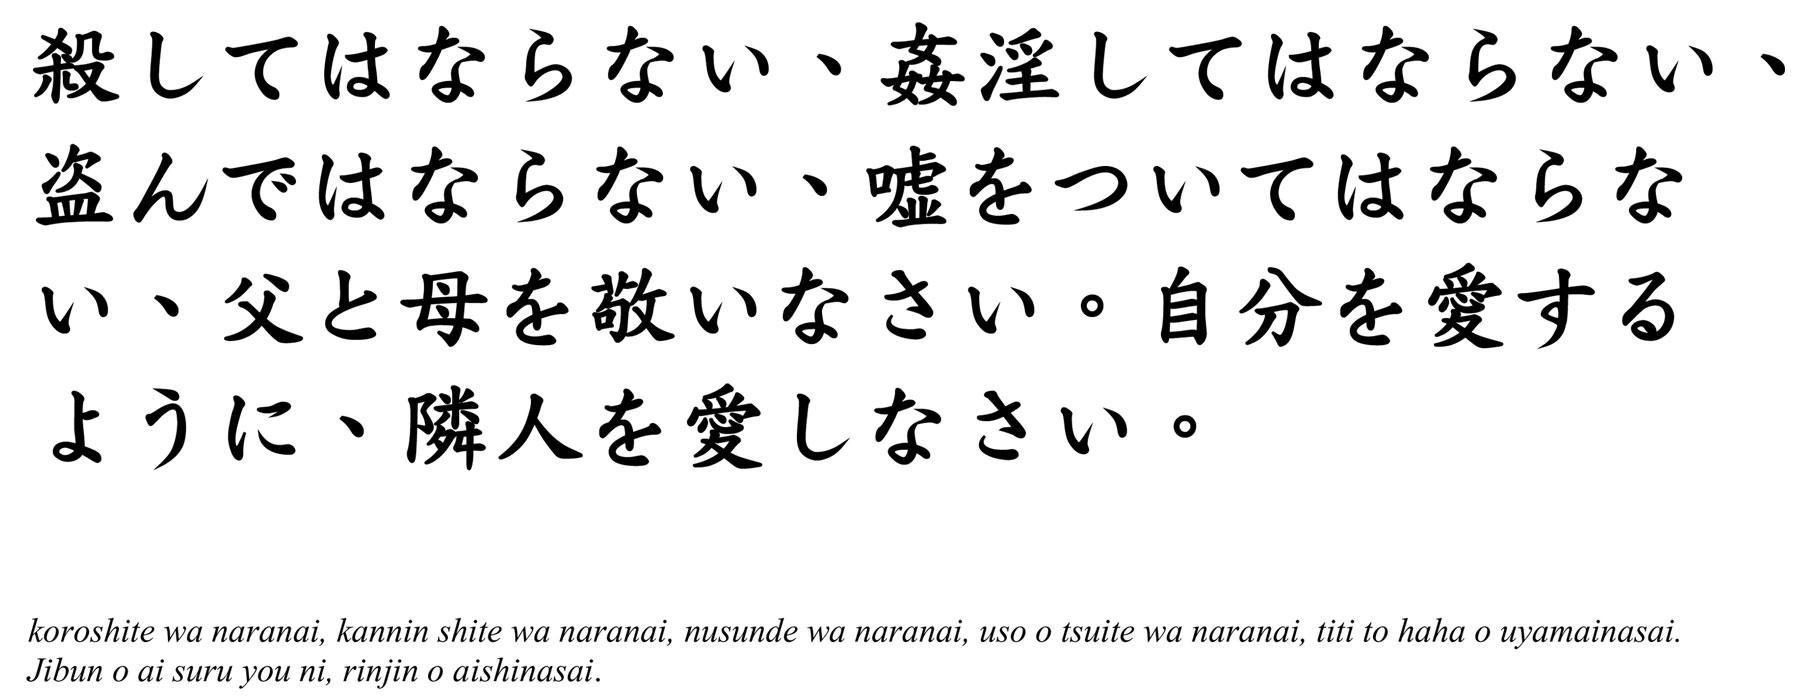 Aula De Japonês Kanji No Dia A Dia Japonês Portal